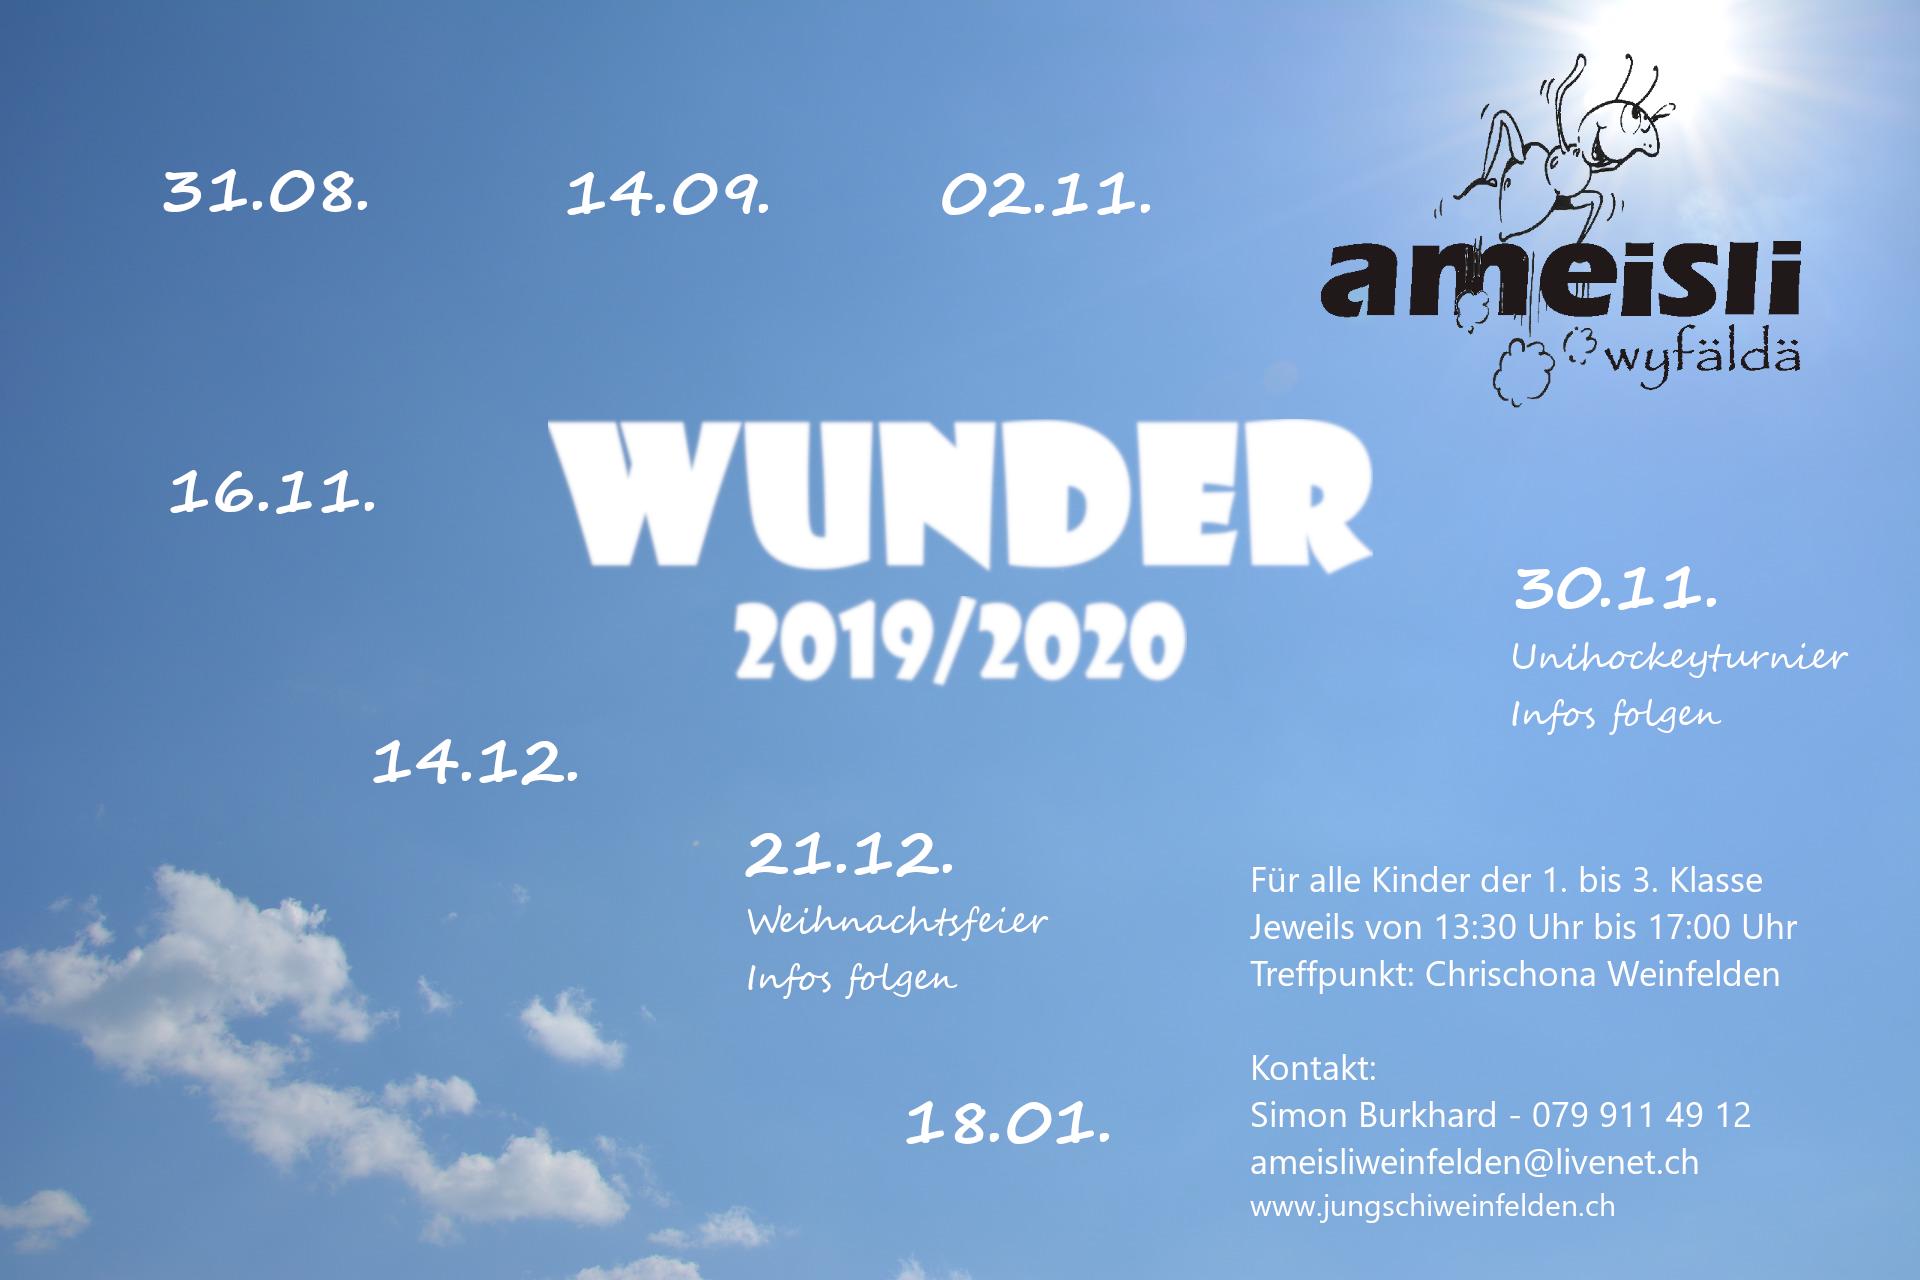 Ameisl Flyer 2019/2020